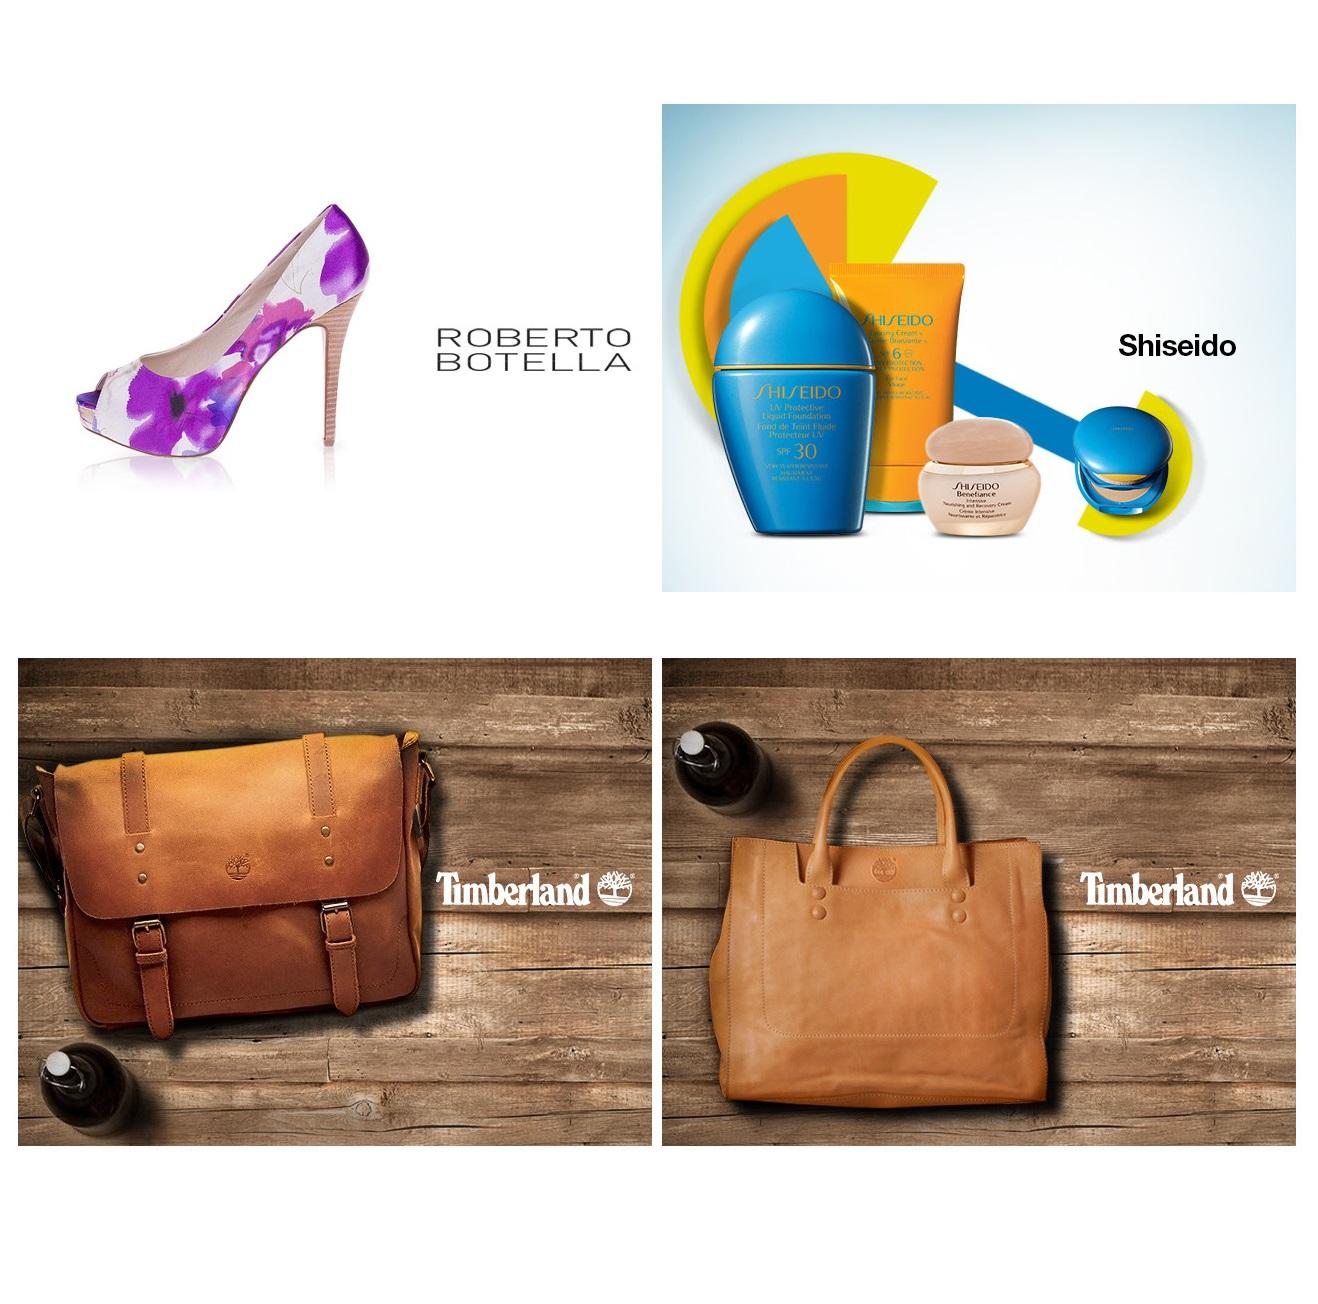 资生堂护肤品/Timberland包袋/Roberto Botella女鞋